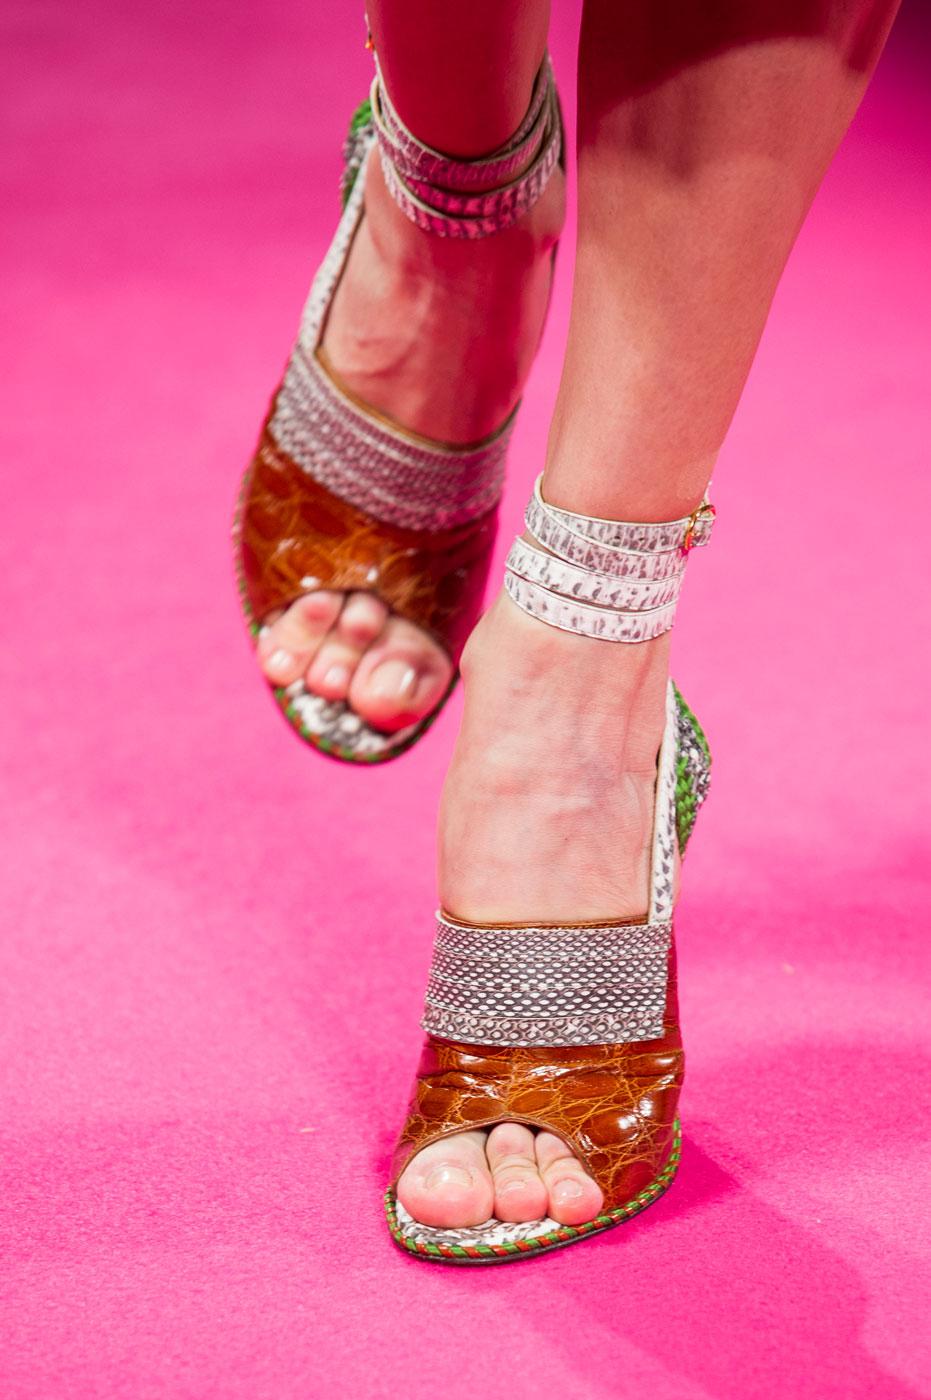 Schiaparelli-fashion-runway-show-close-ups-haute-couture-paris-spring-summer-2015-the-impression-52